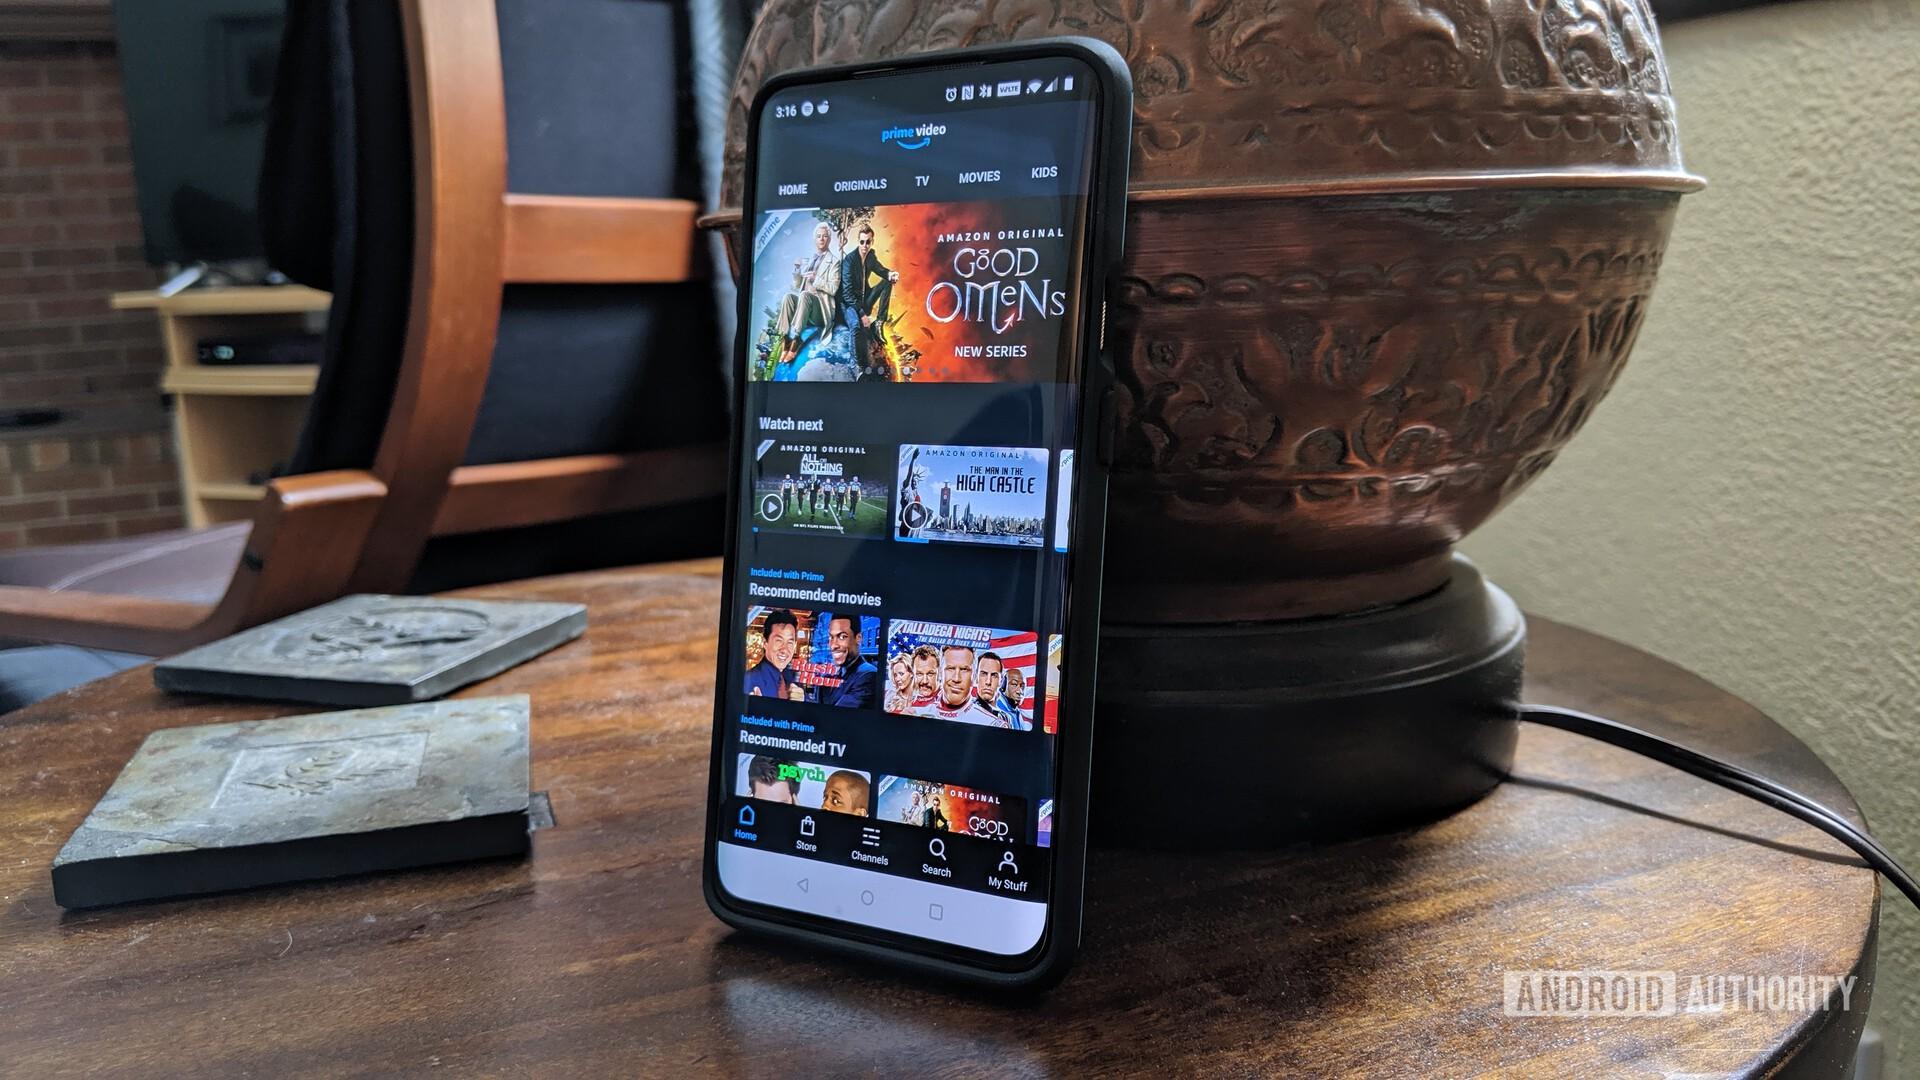 new on Amazon Prime Video - Amazon Prime Video app running on a OnePlus 7 Pro